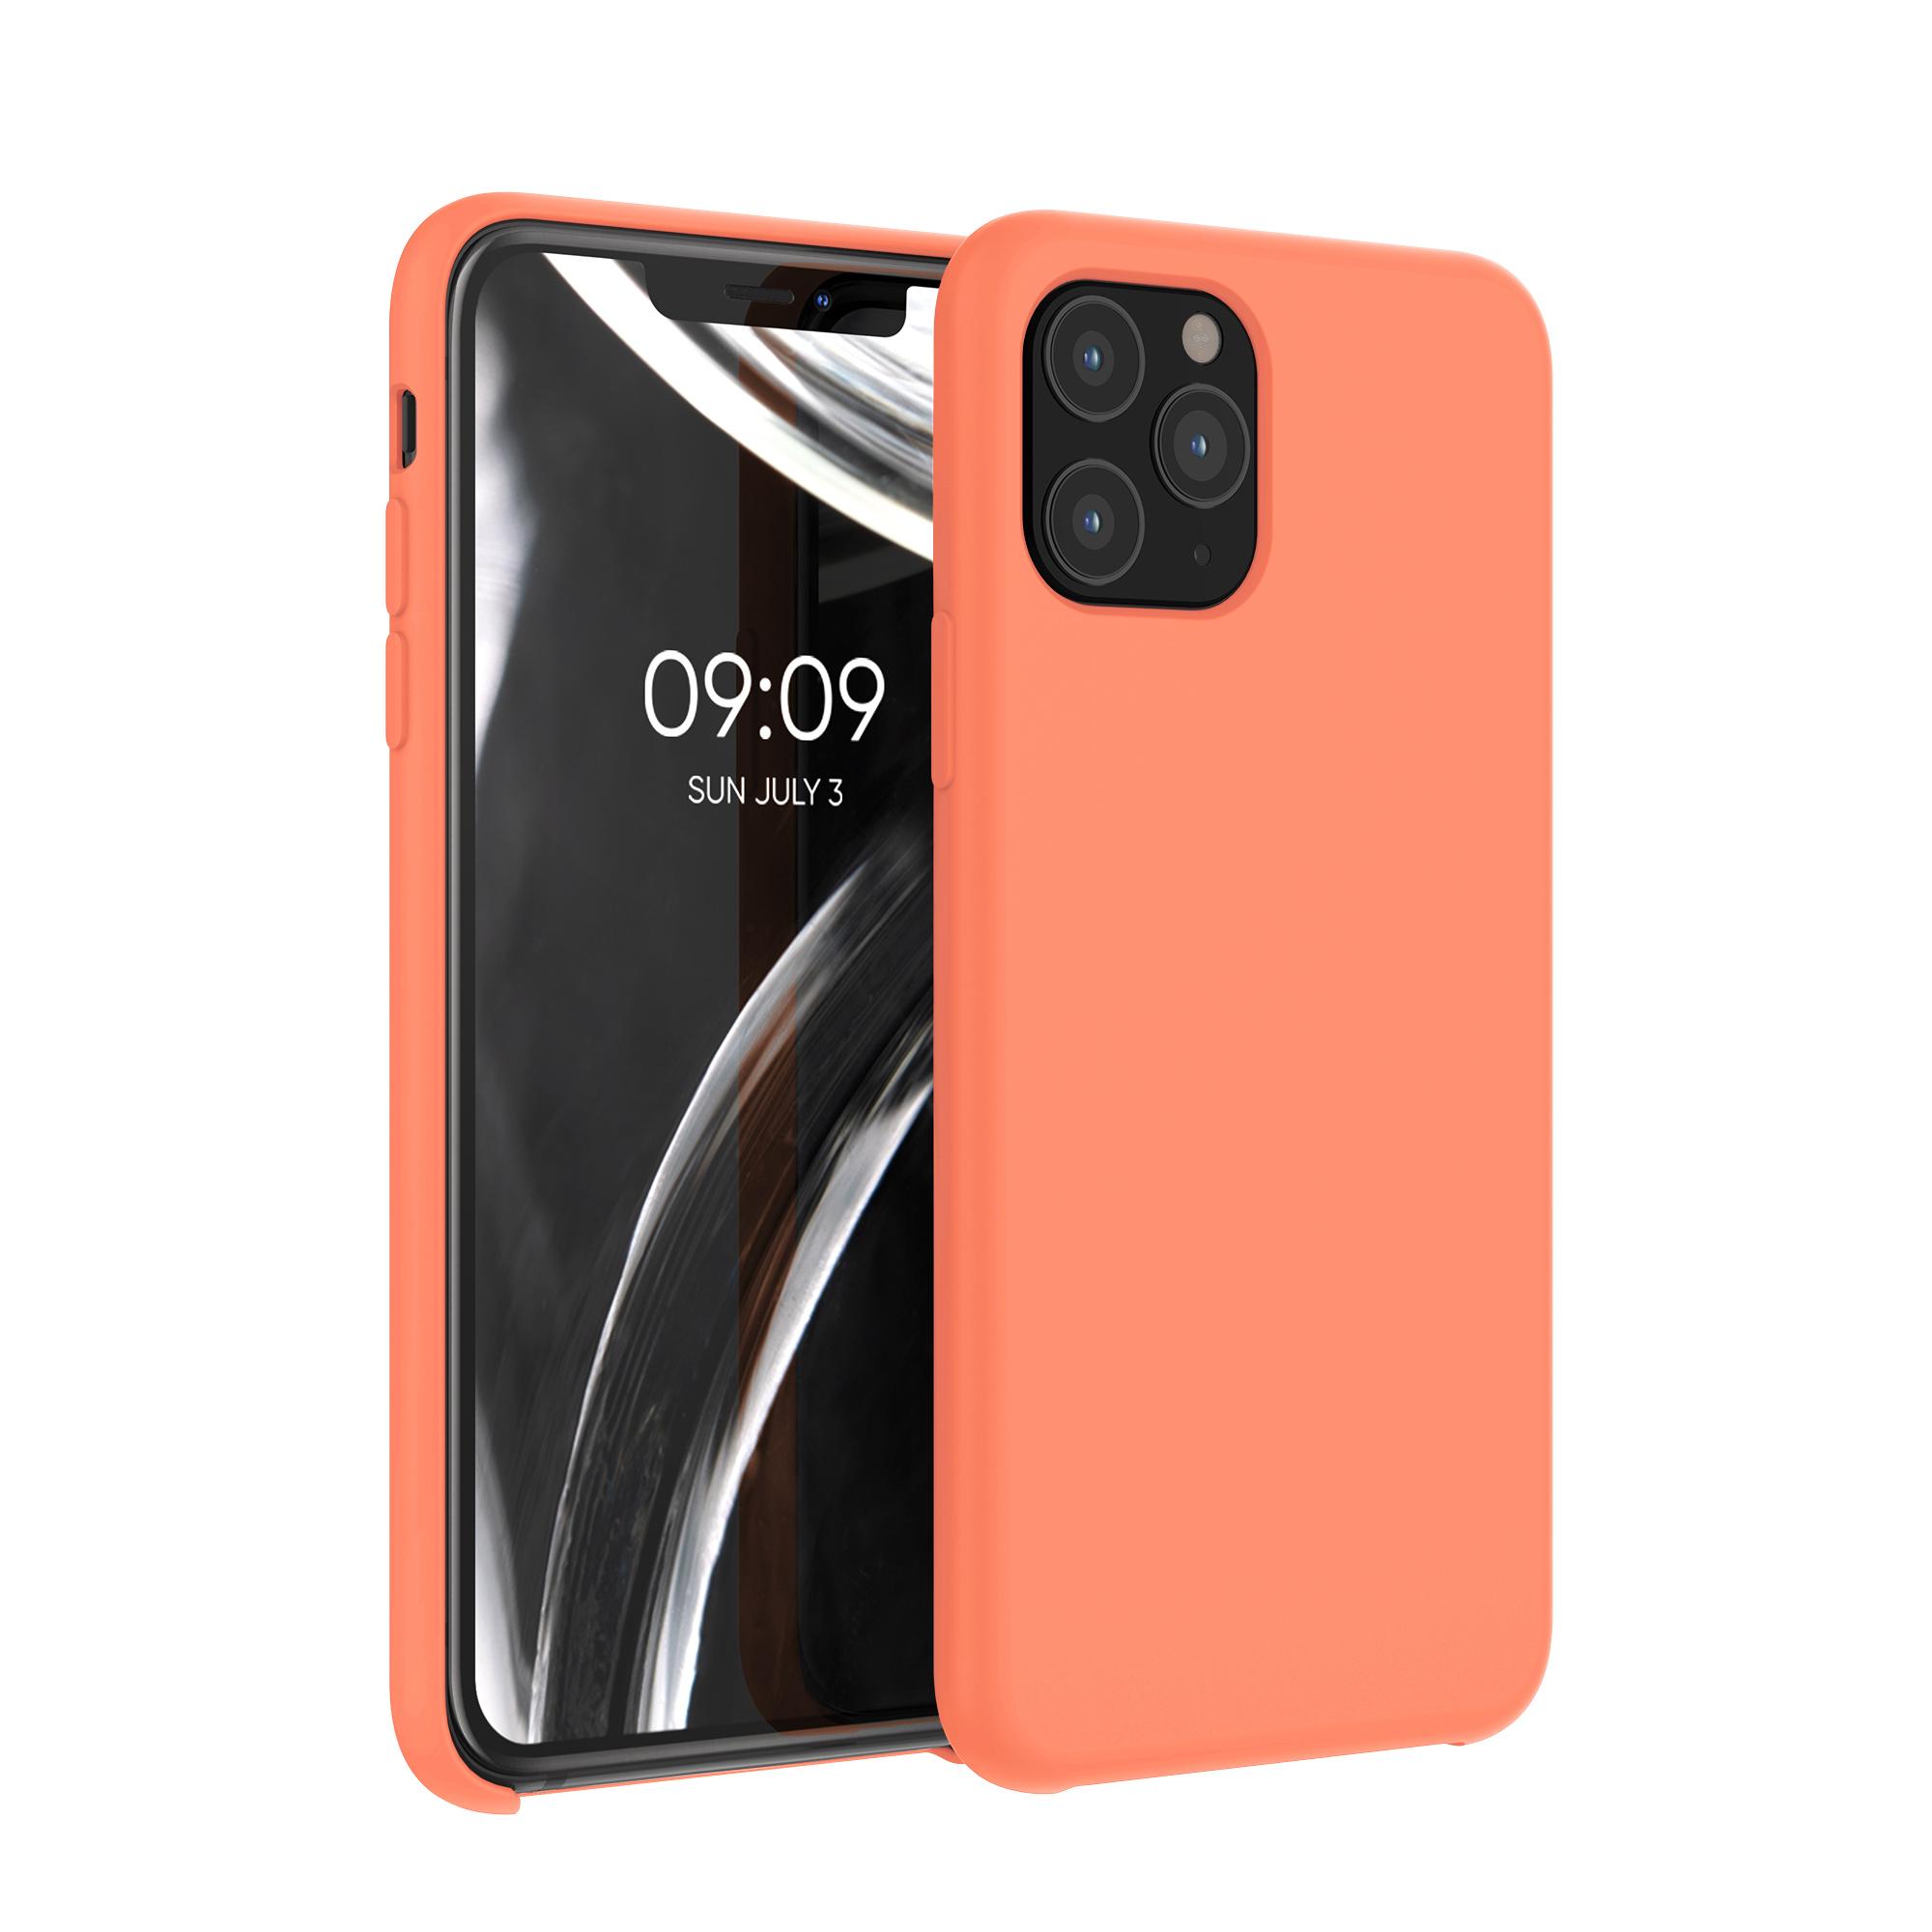 Kvalitní silikonové TPU pouzdro pro Apple iPhone 11 Pro - Sunrise Orange